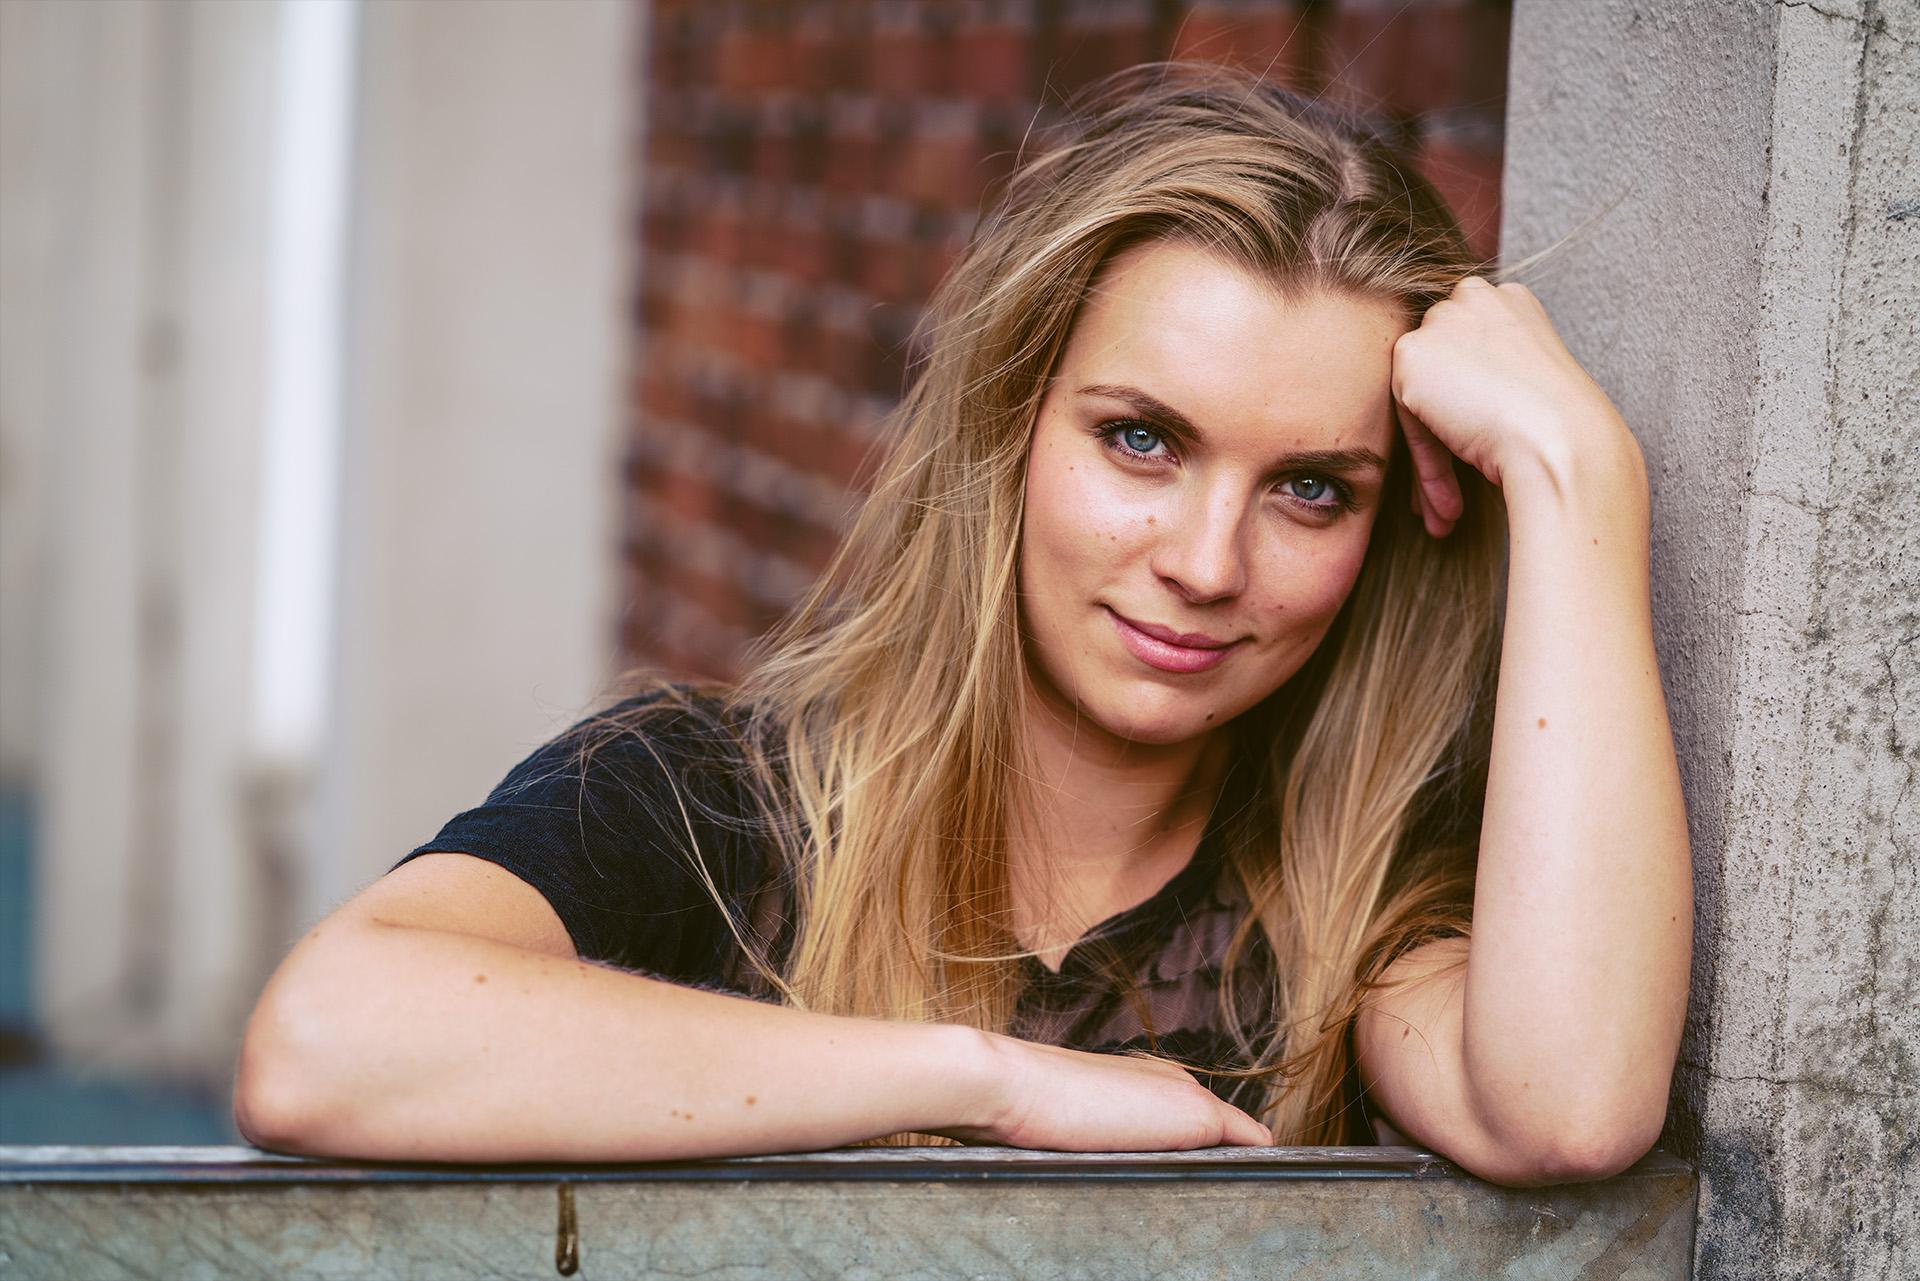 Marlene Krursel